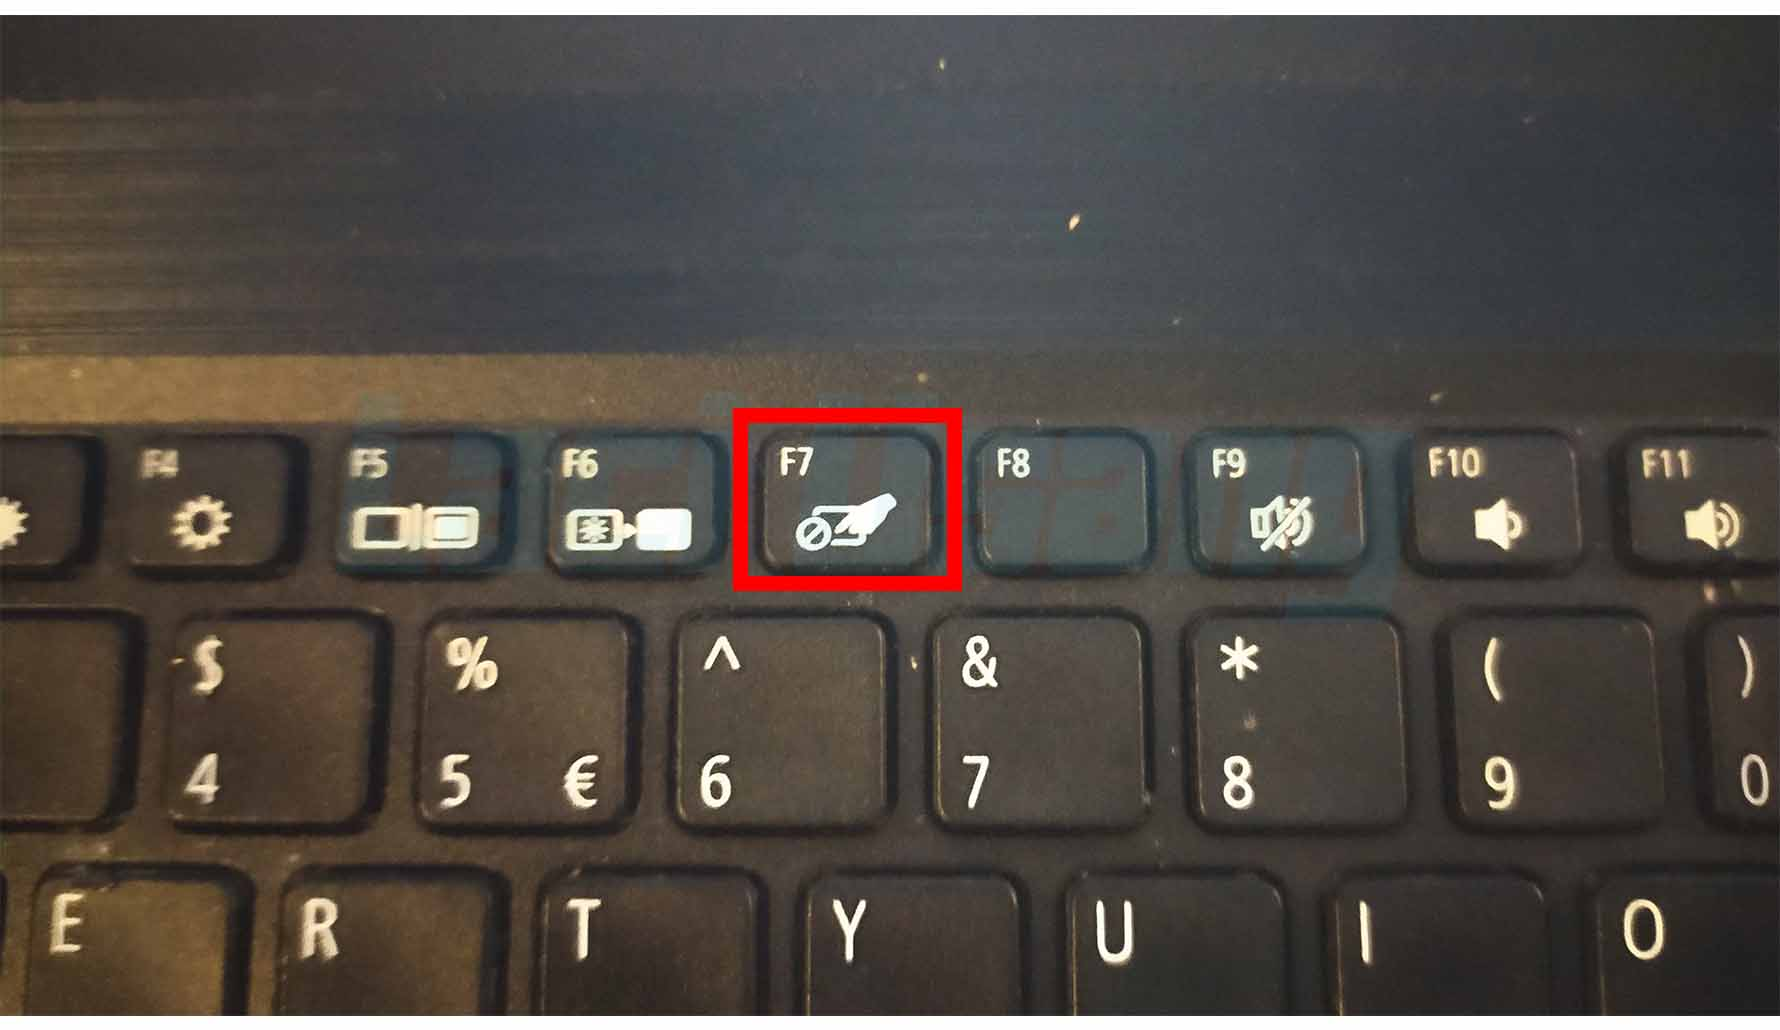 Cara Mengaktifkan Kembali Touchpad Laptop Acer